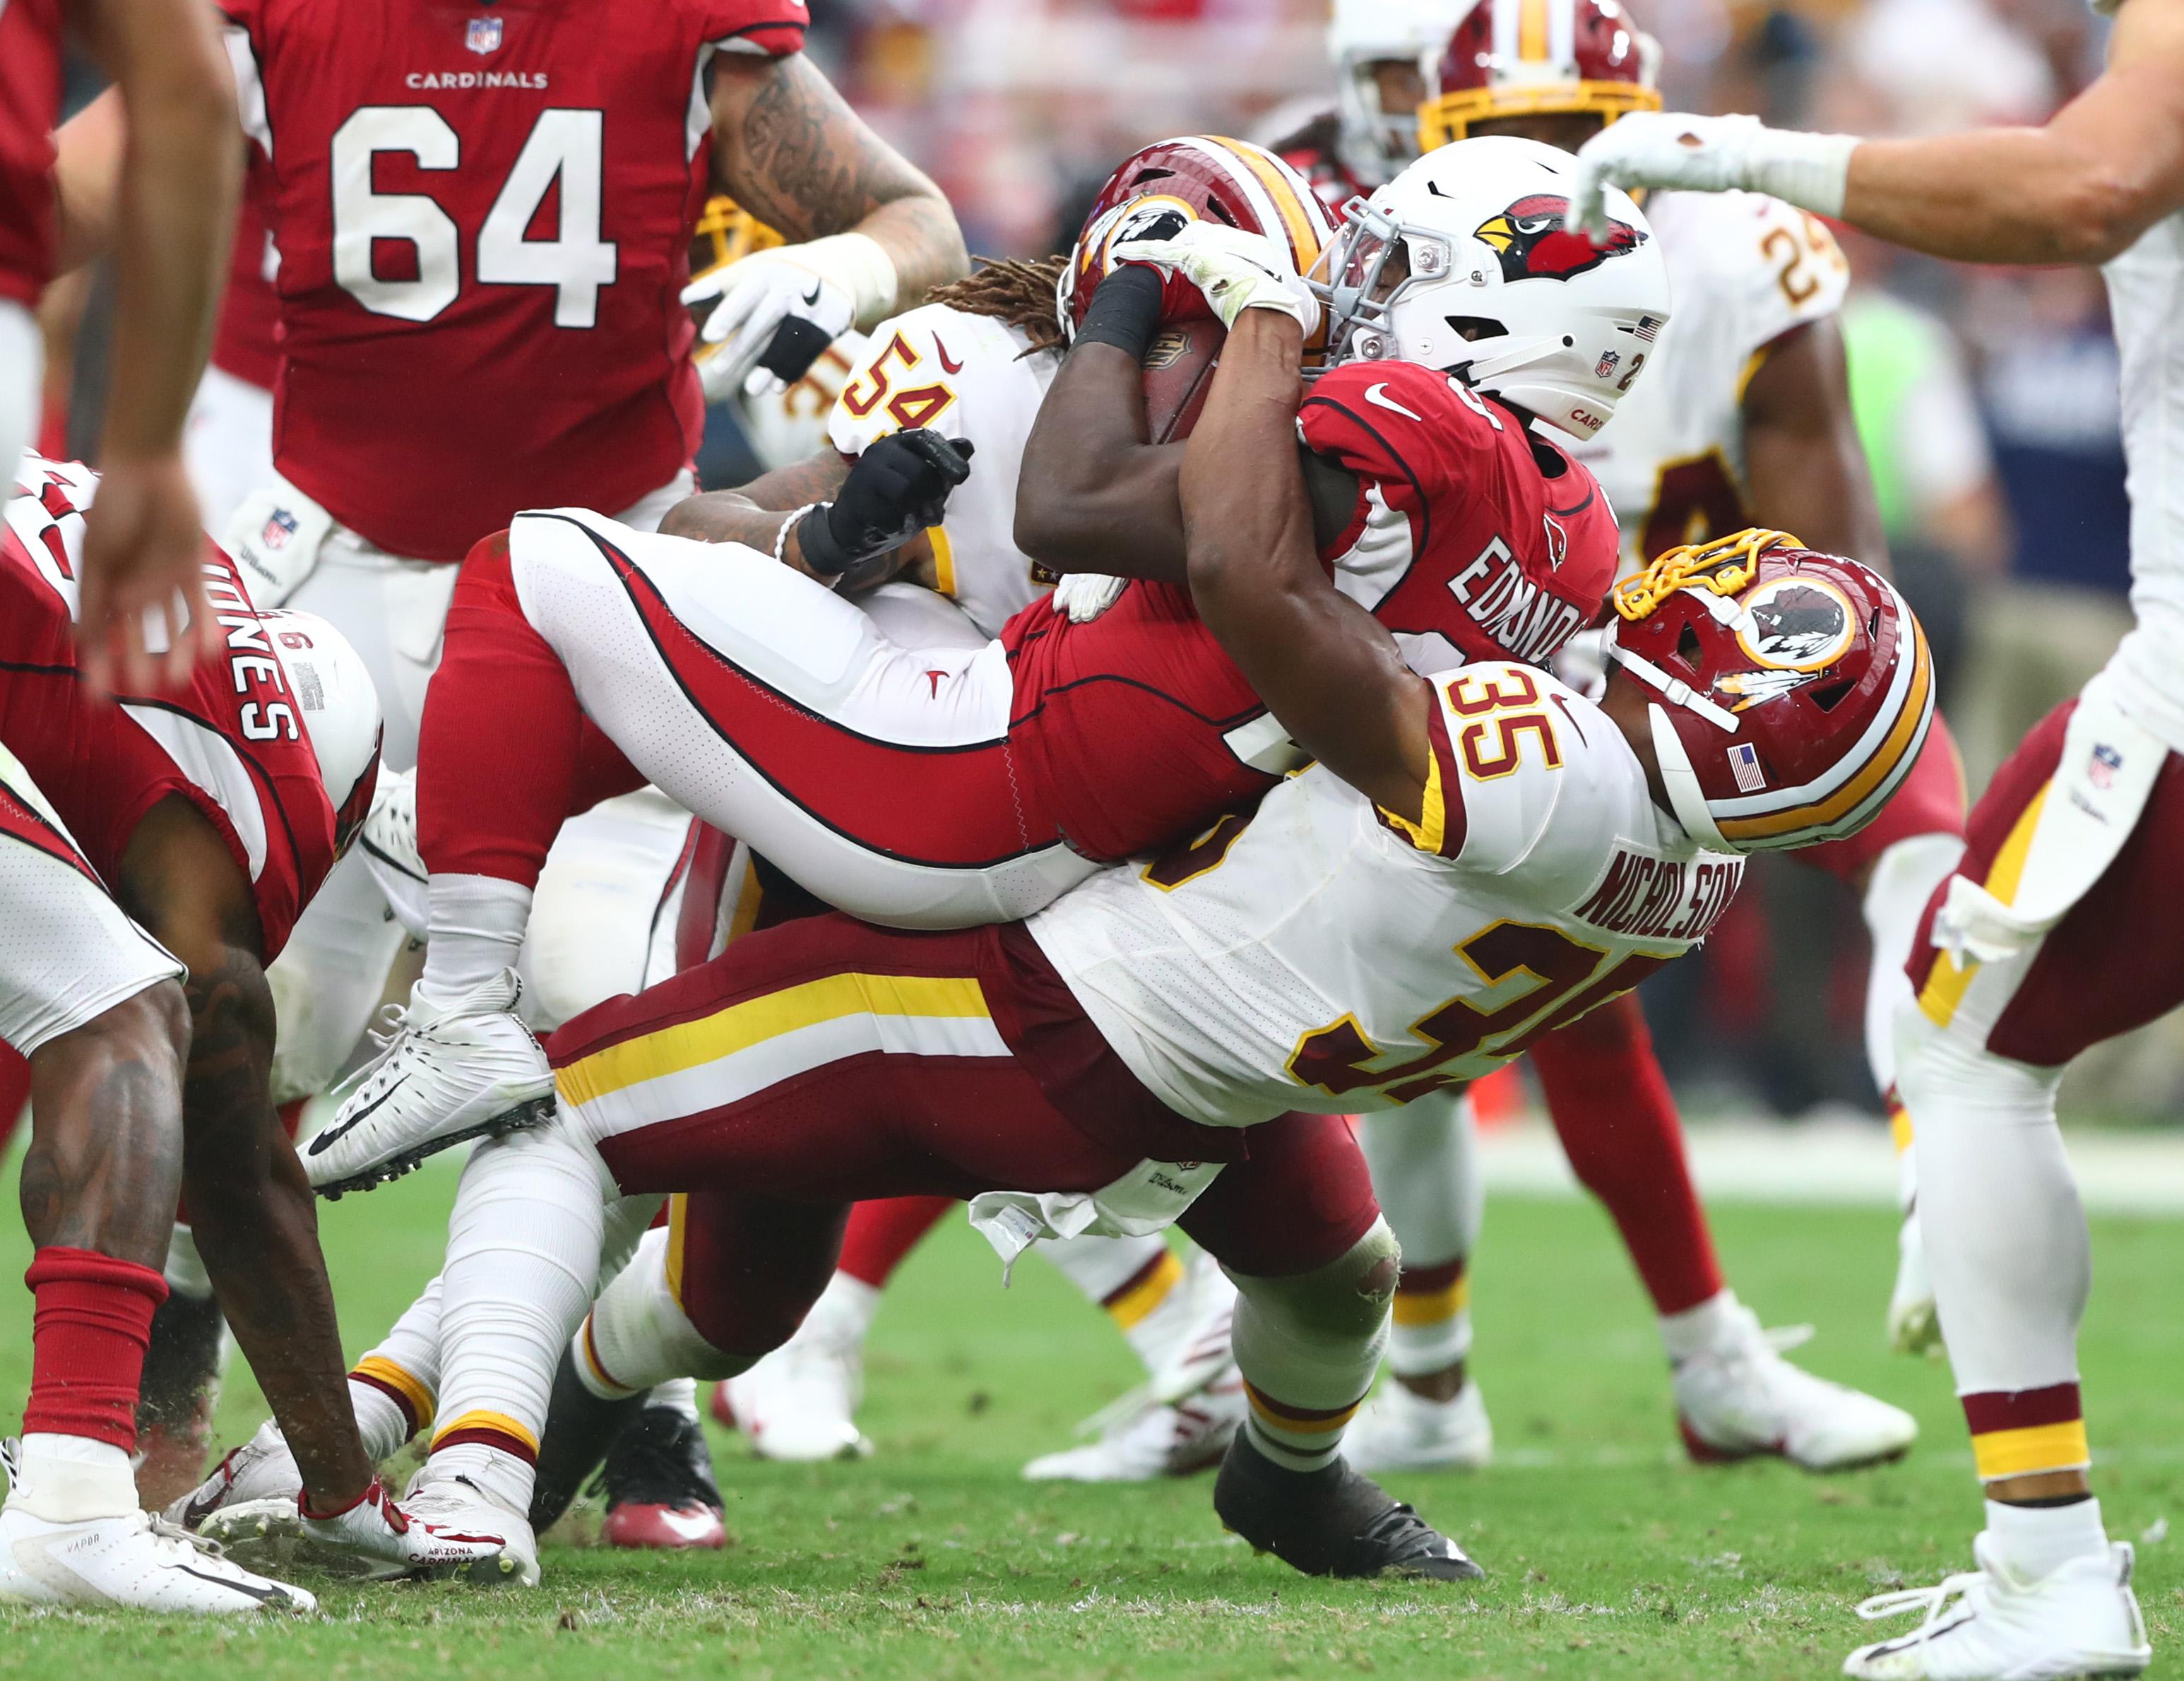 NFL: Washington Redskins at Arizona Cardinals